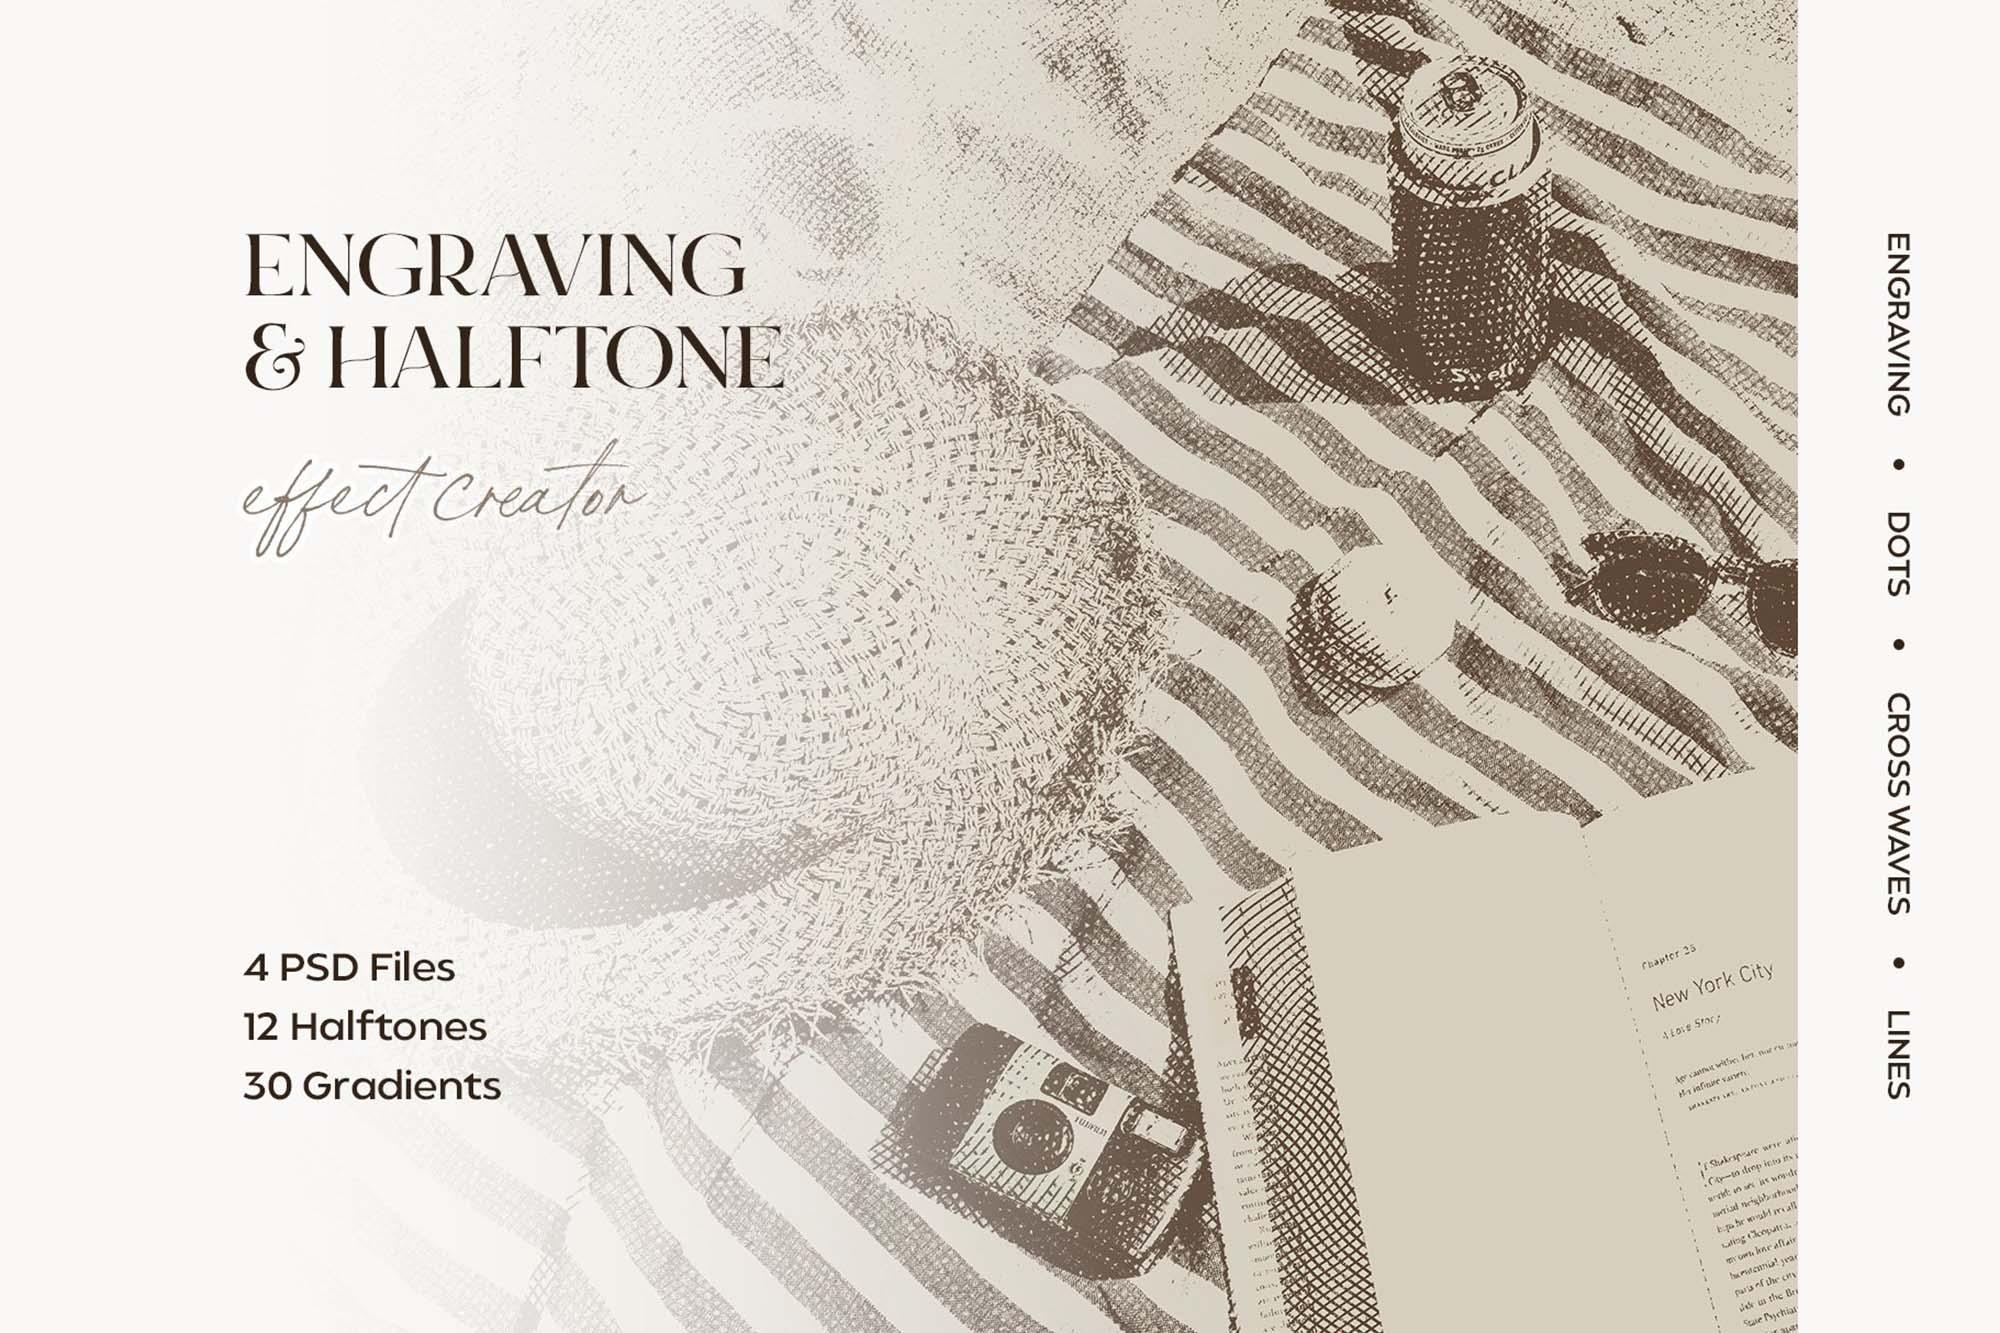 Engraving & Halftone Effect Creator